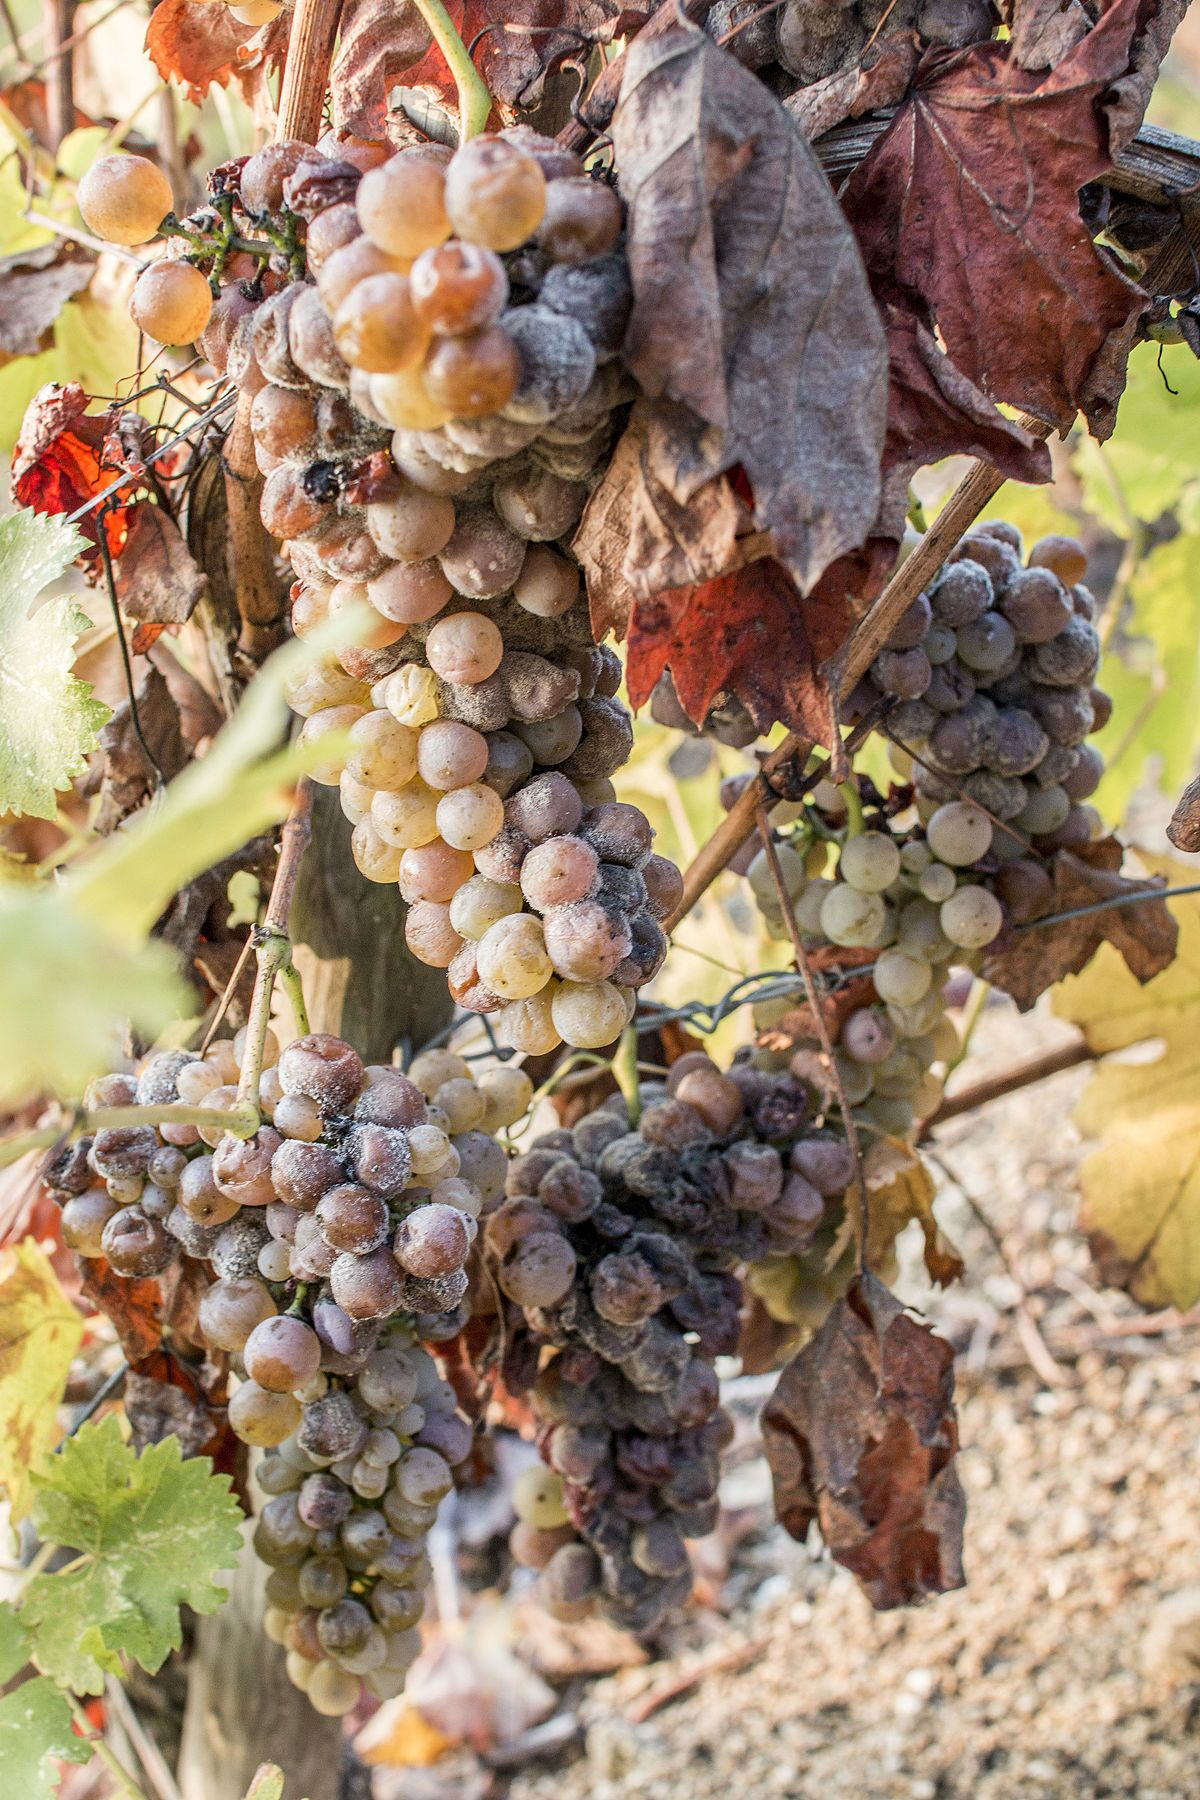 Pourriture noble wikip dia - Maladie du raisin photo ...